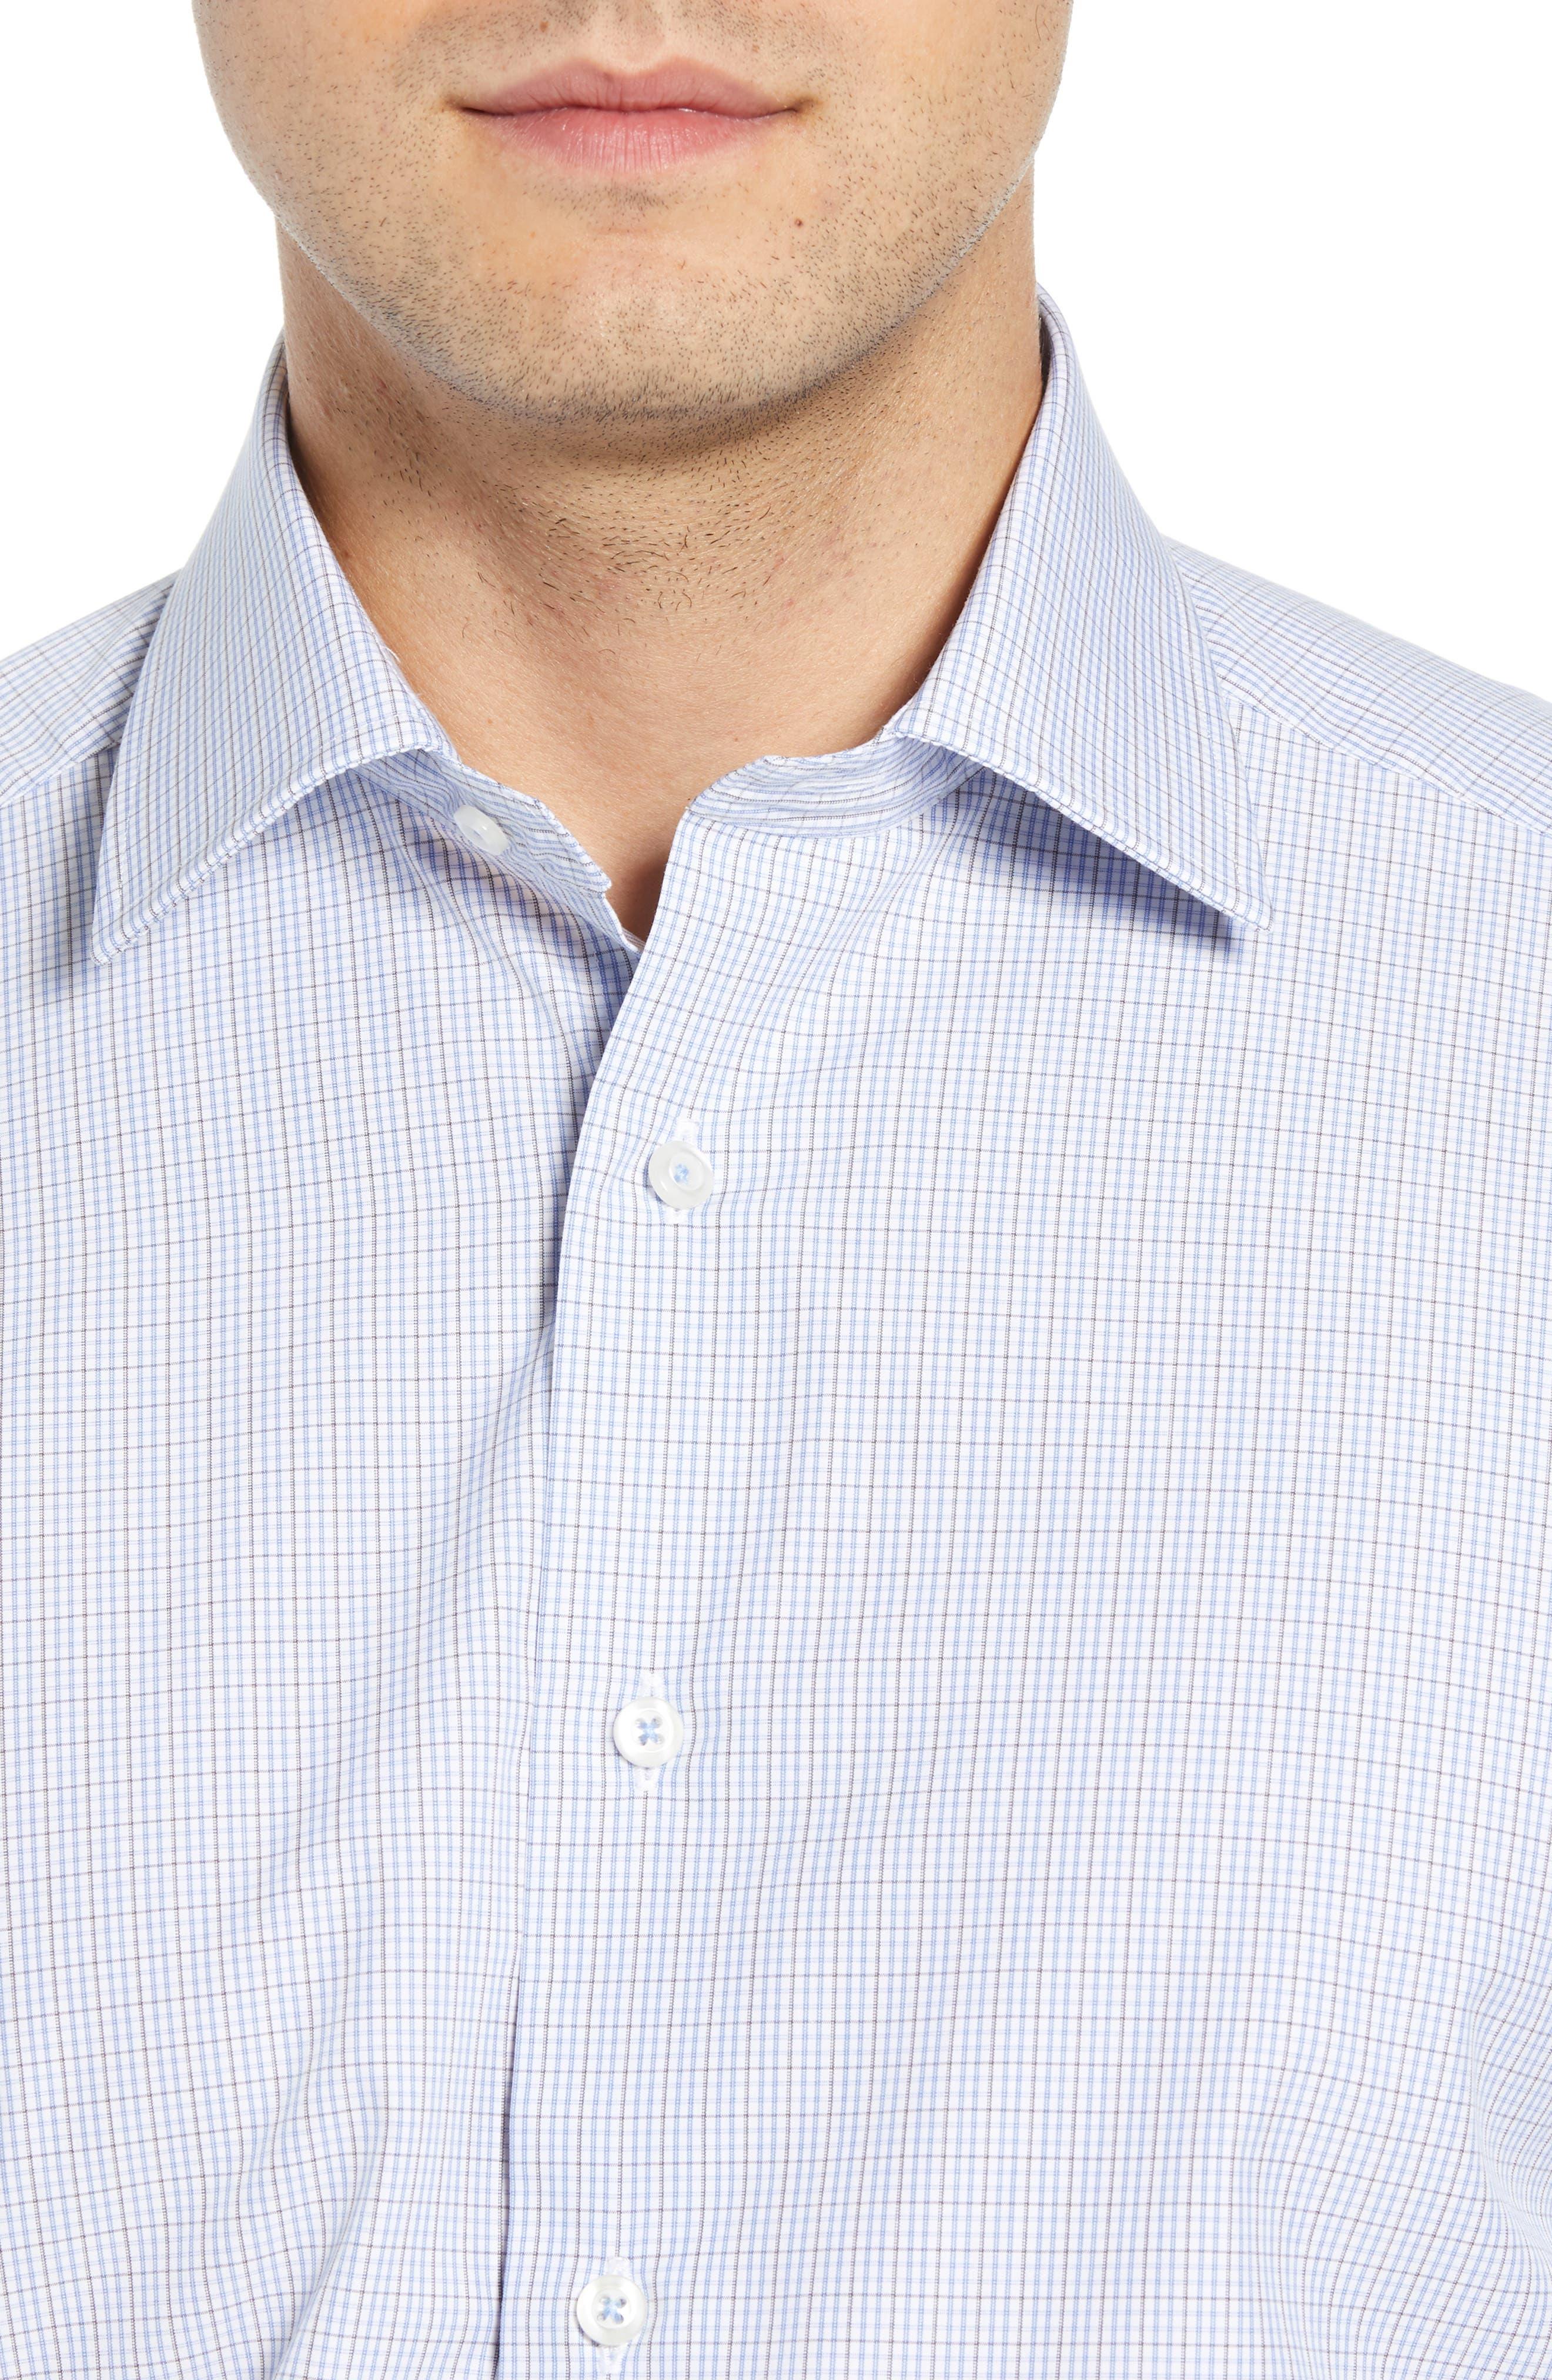 Regular Fit Check Dress Shirt,                             Alternate thumbnail 2, color,                             020